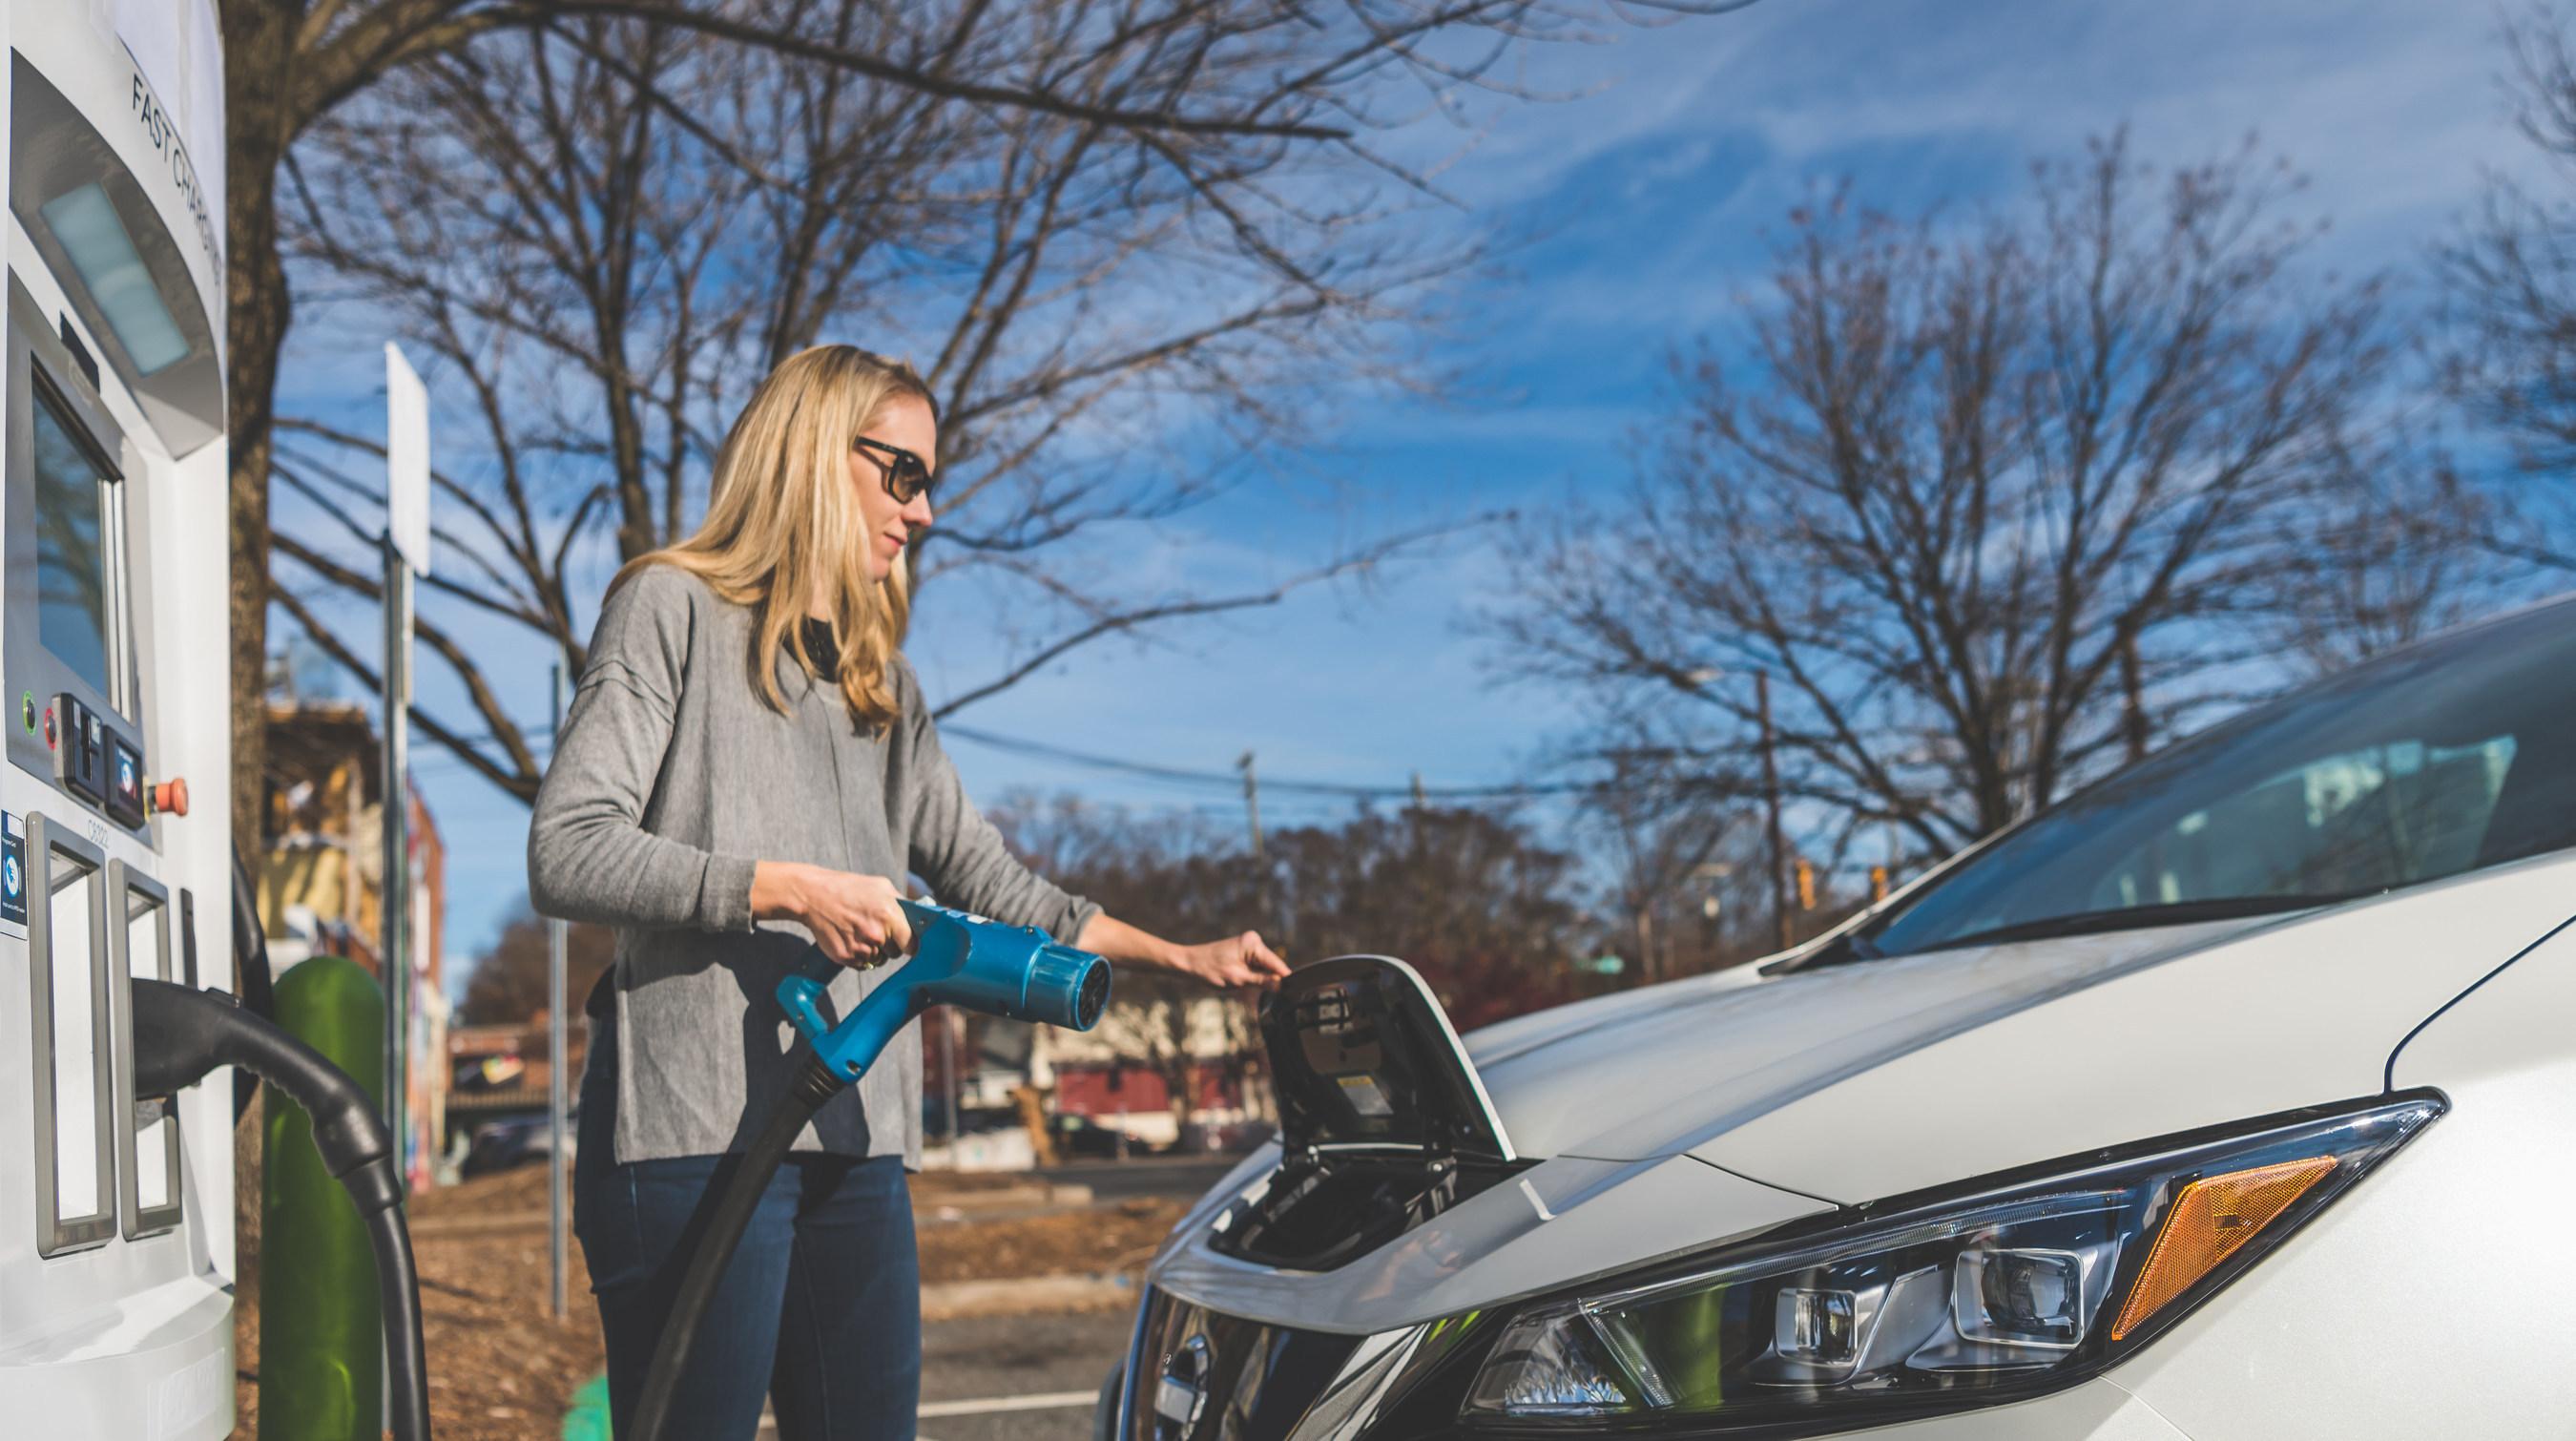 Duke Energy Proposes $76M EV Program in North Carolina